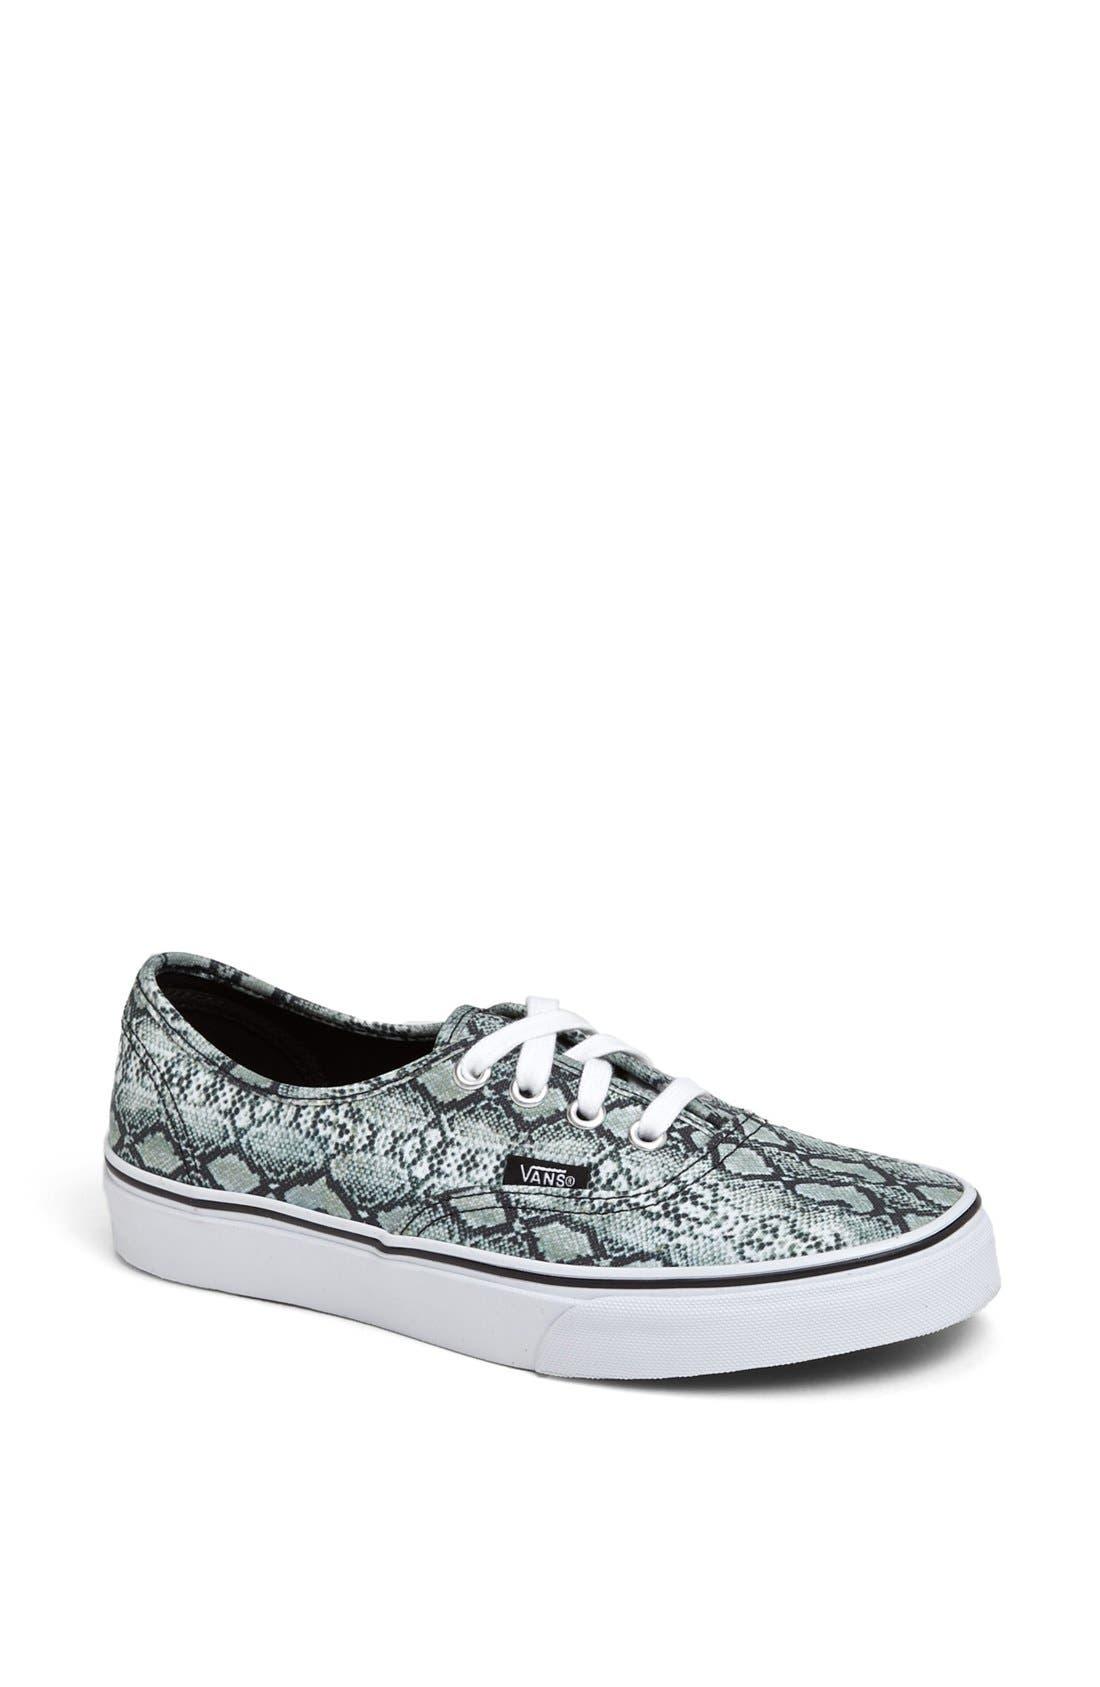 Main Image - Vans 'Authentic - Snake Print' Sneaker (Women)